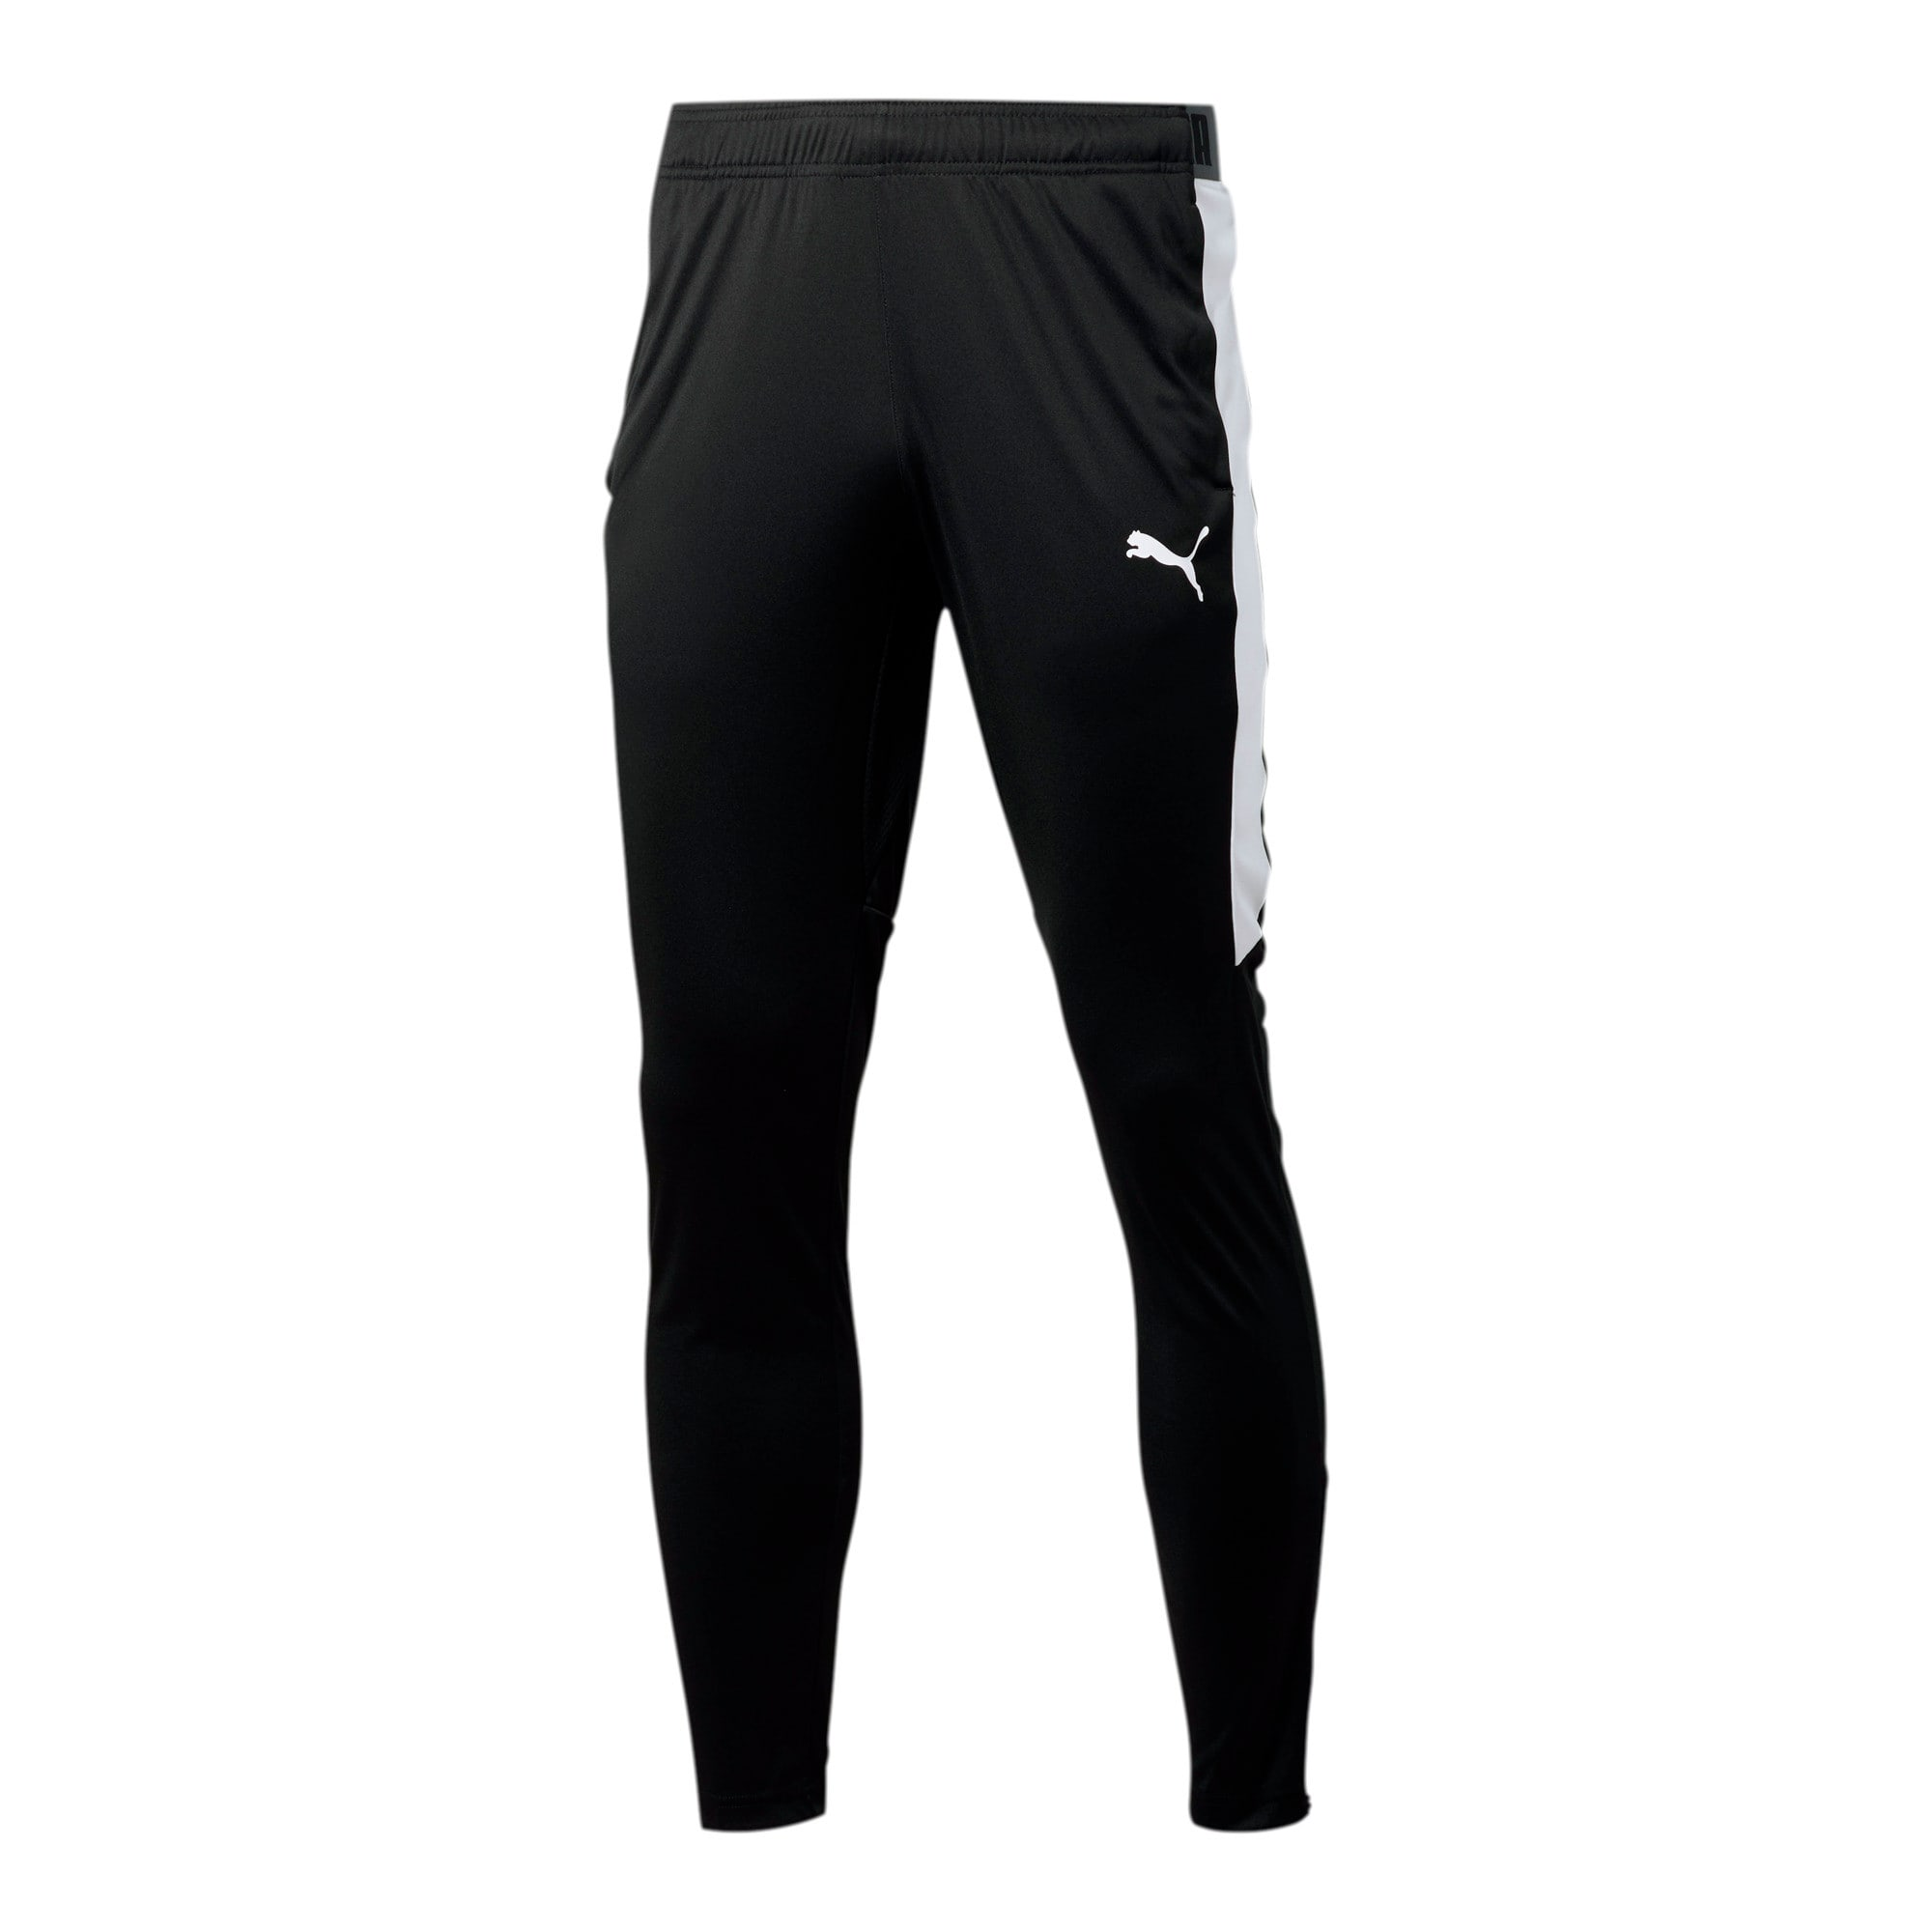 Thumbnail 2 of Men's Speed Pants, Puma Black-Puma White, medium